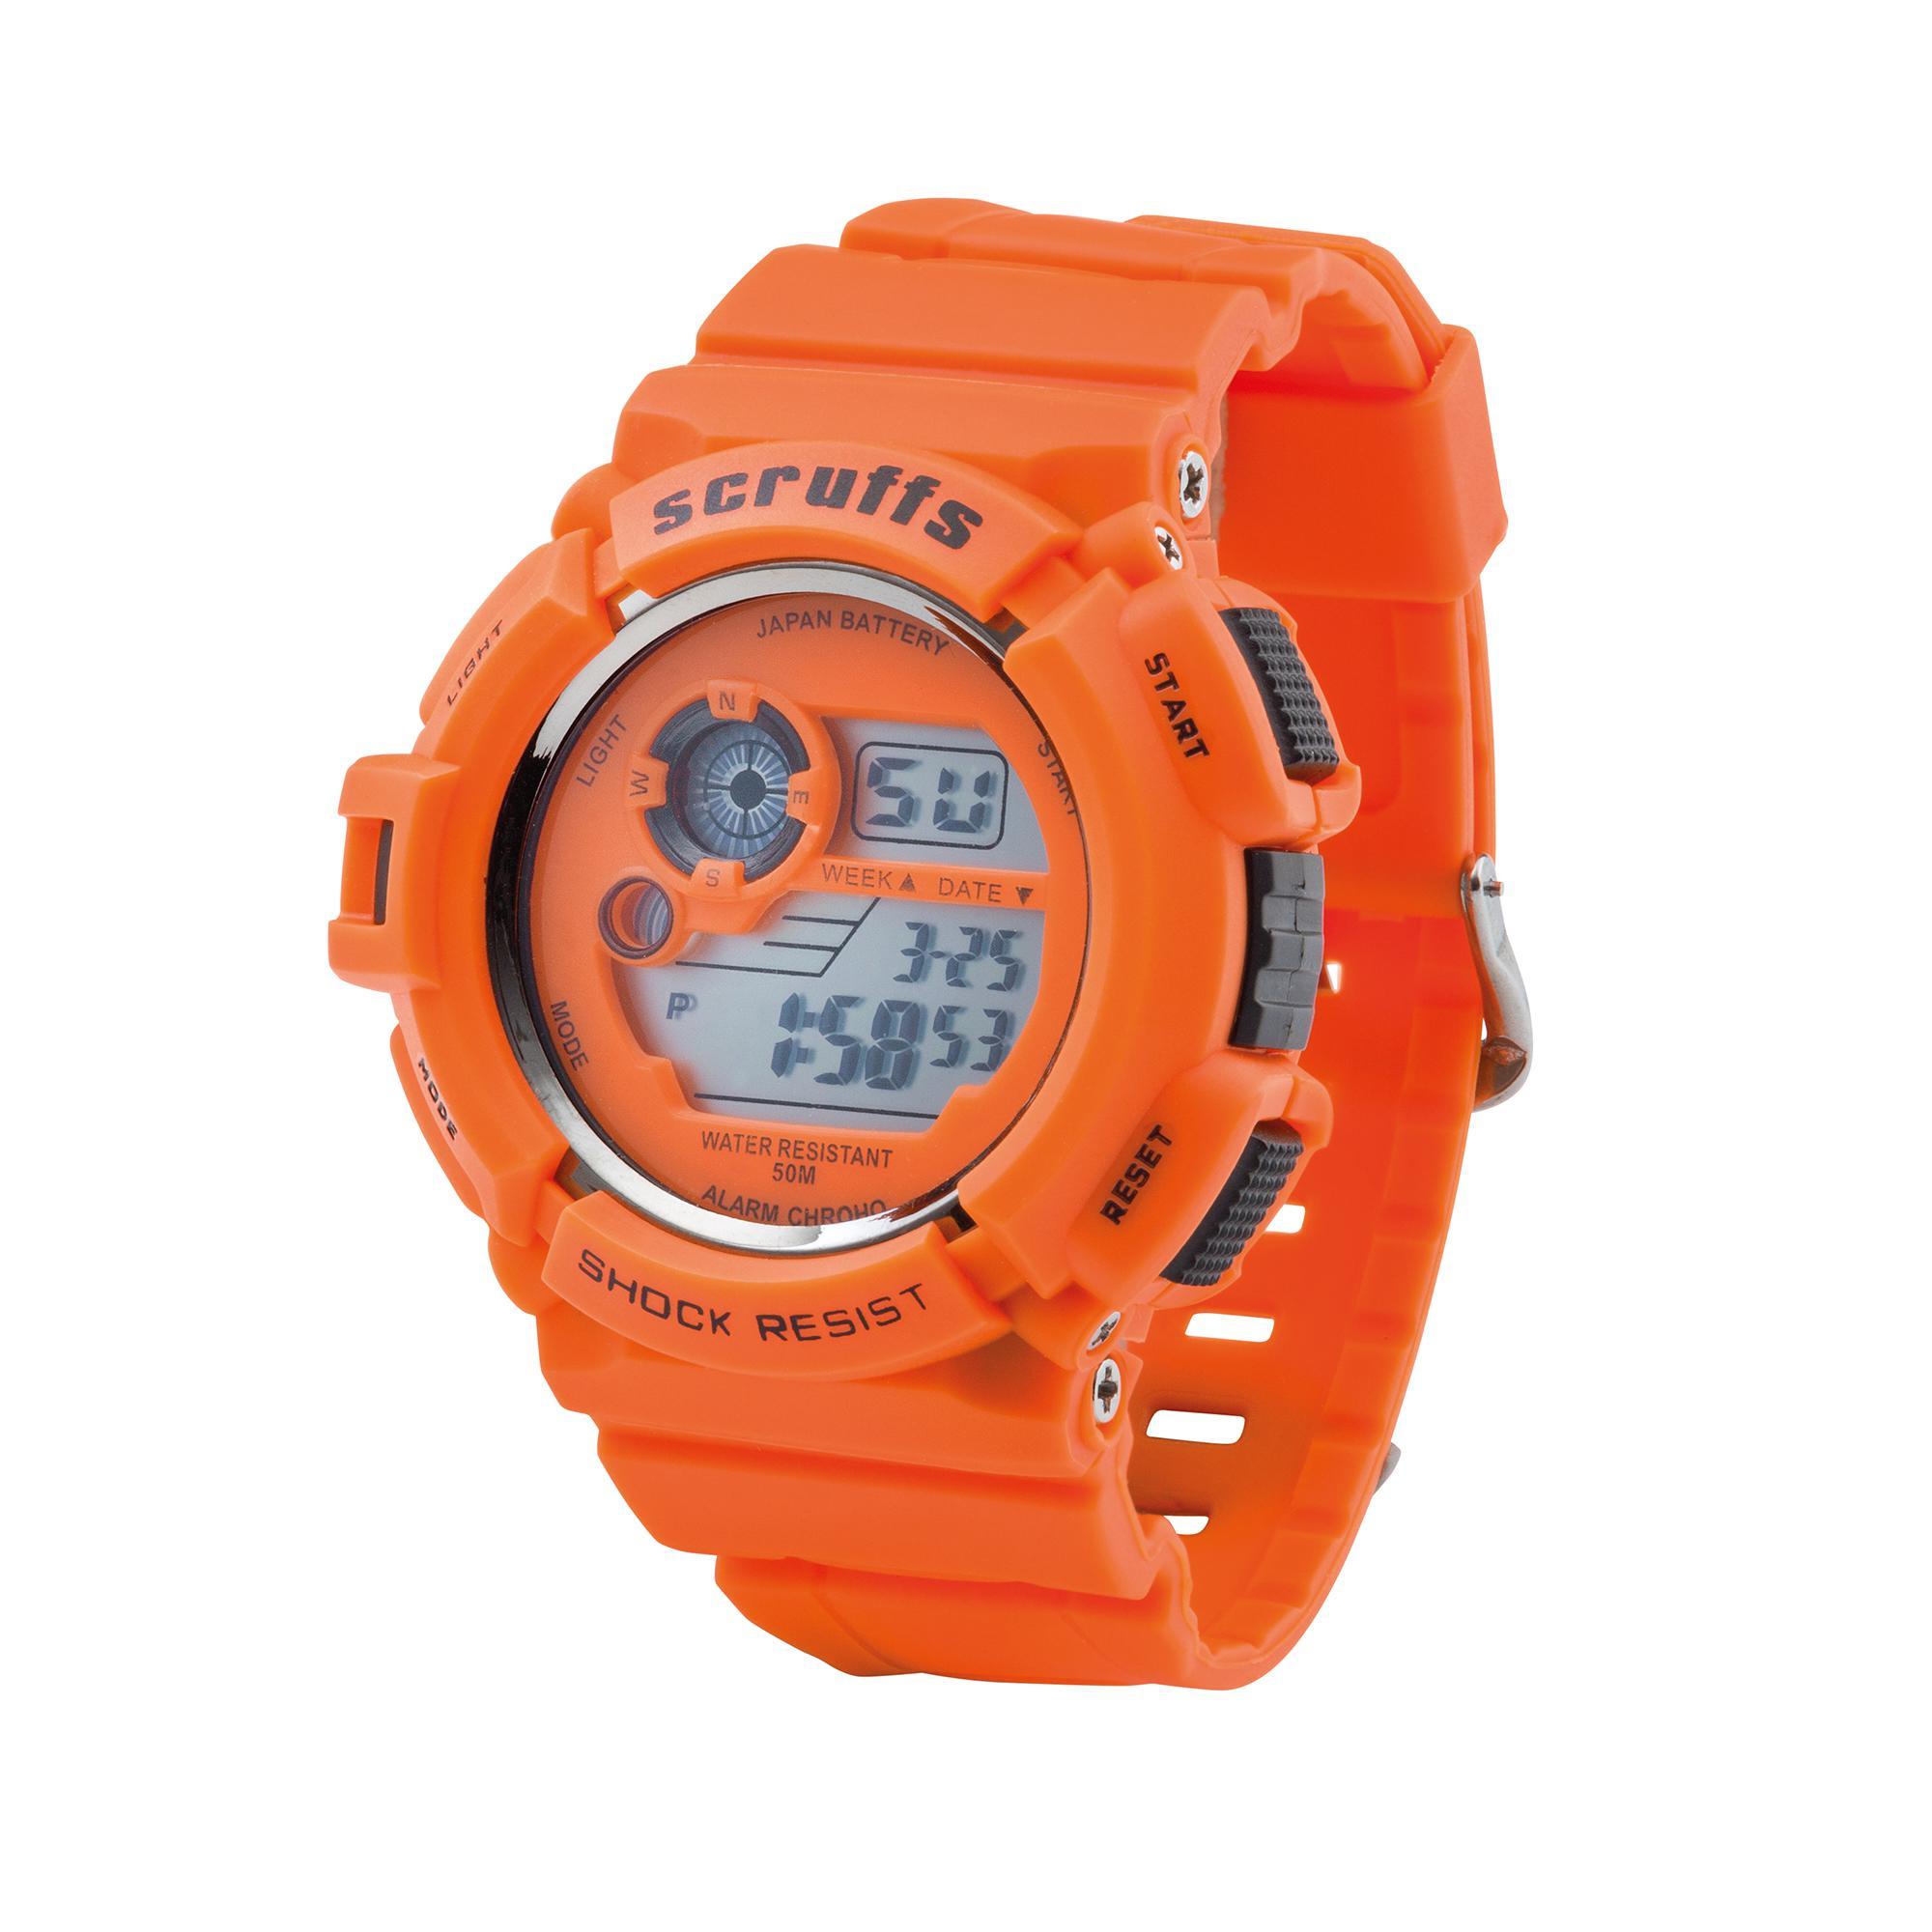 Scruffs Watch